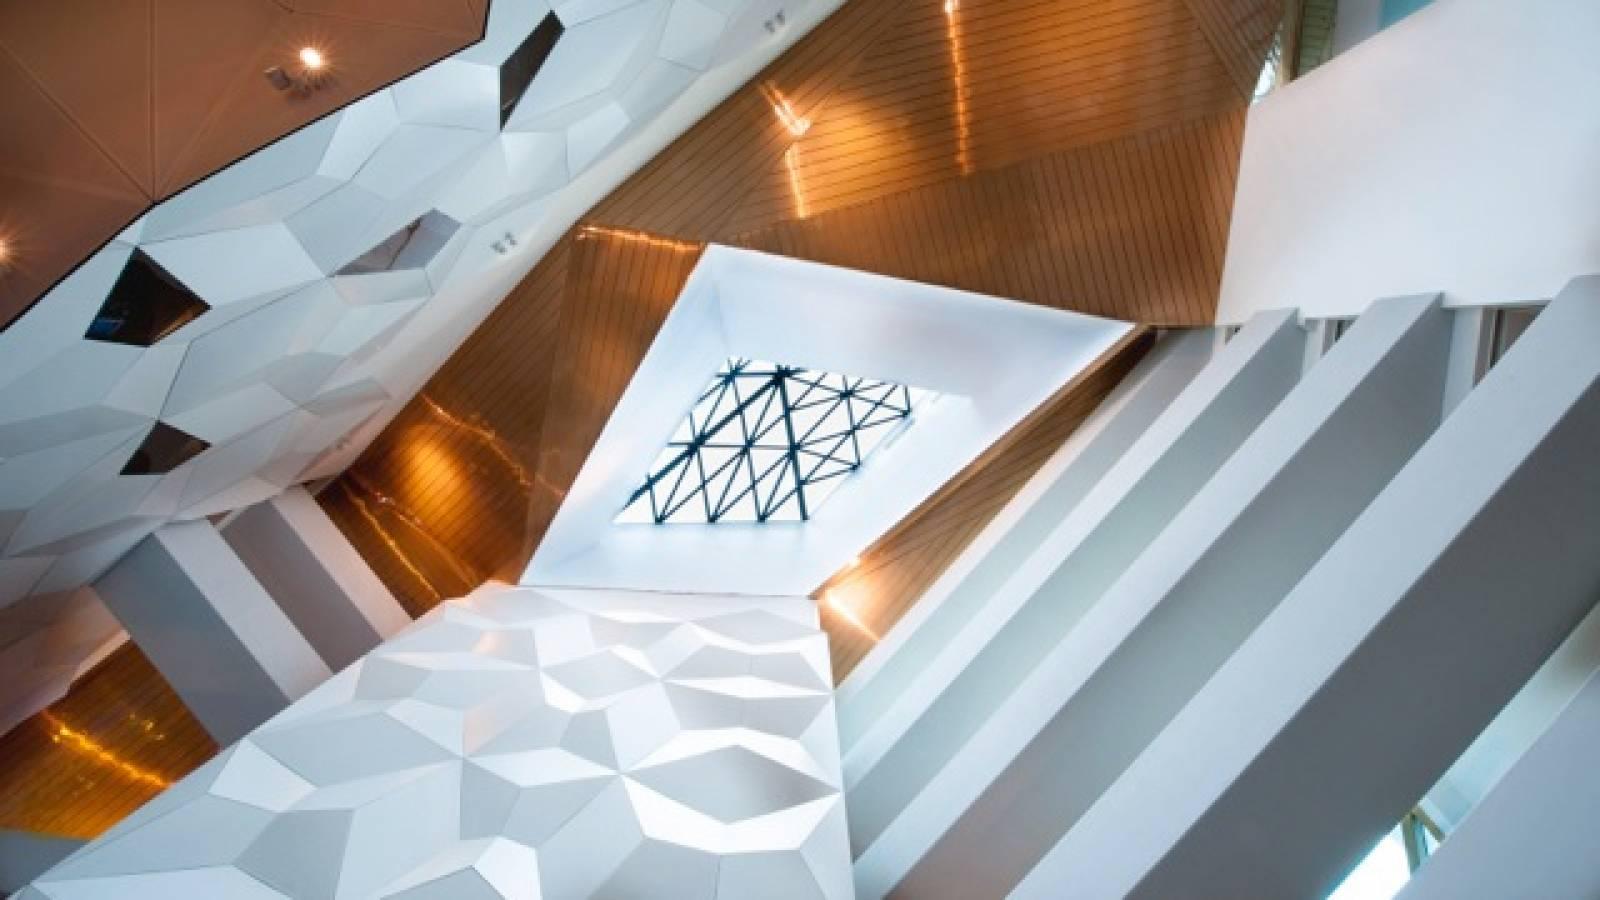 ATRIUM WITH BRIDGES - Clarion Hotel & Congress - SPOL Architects